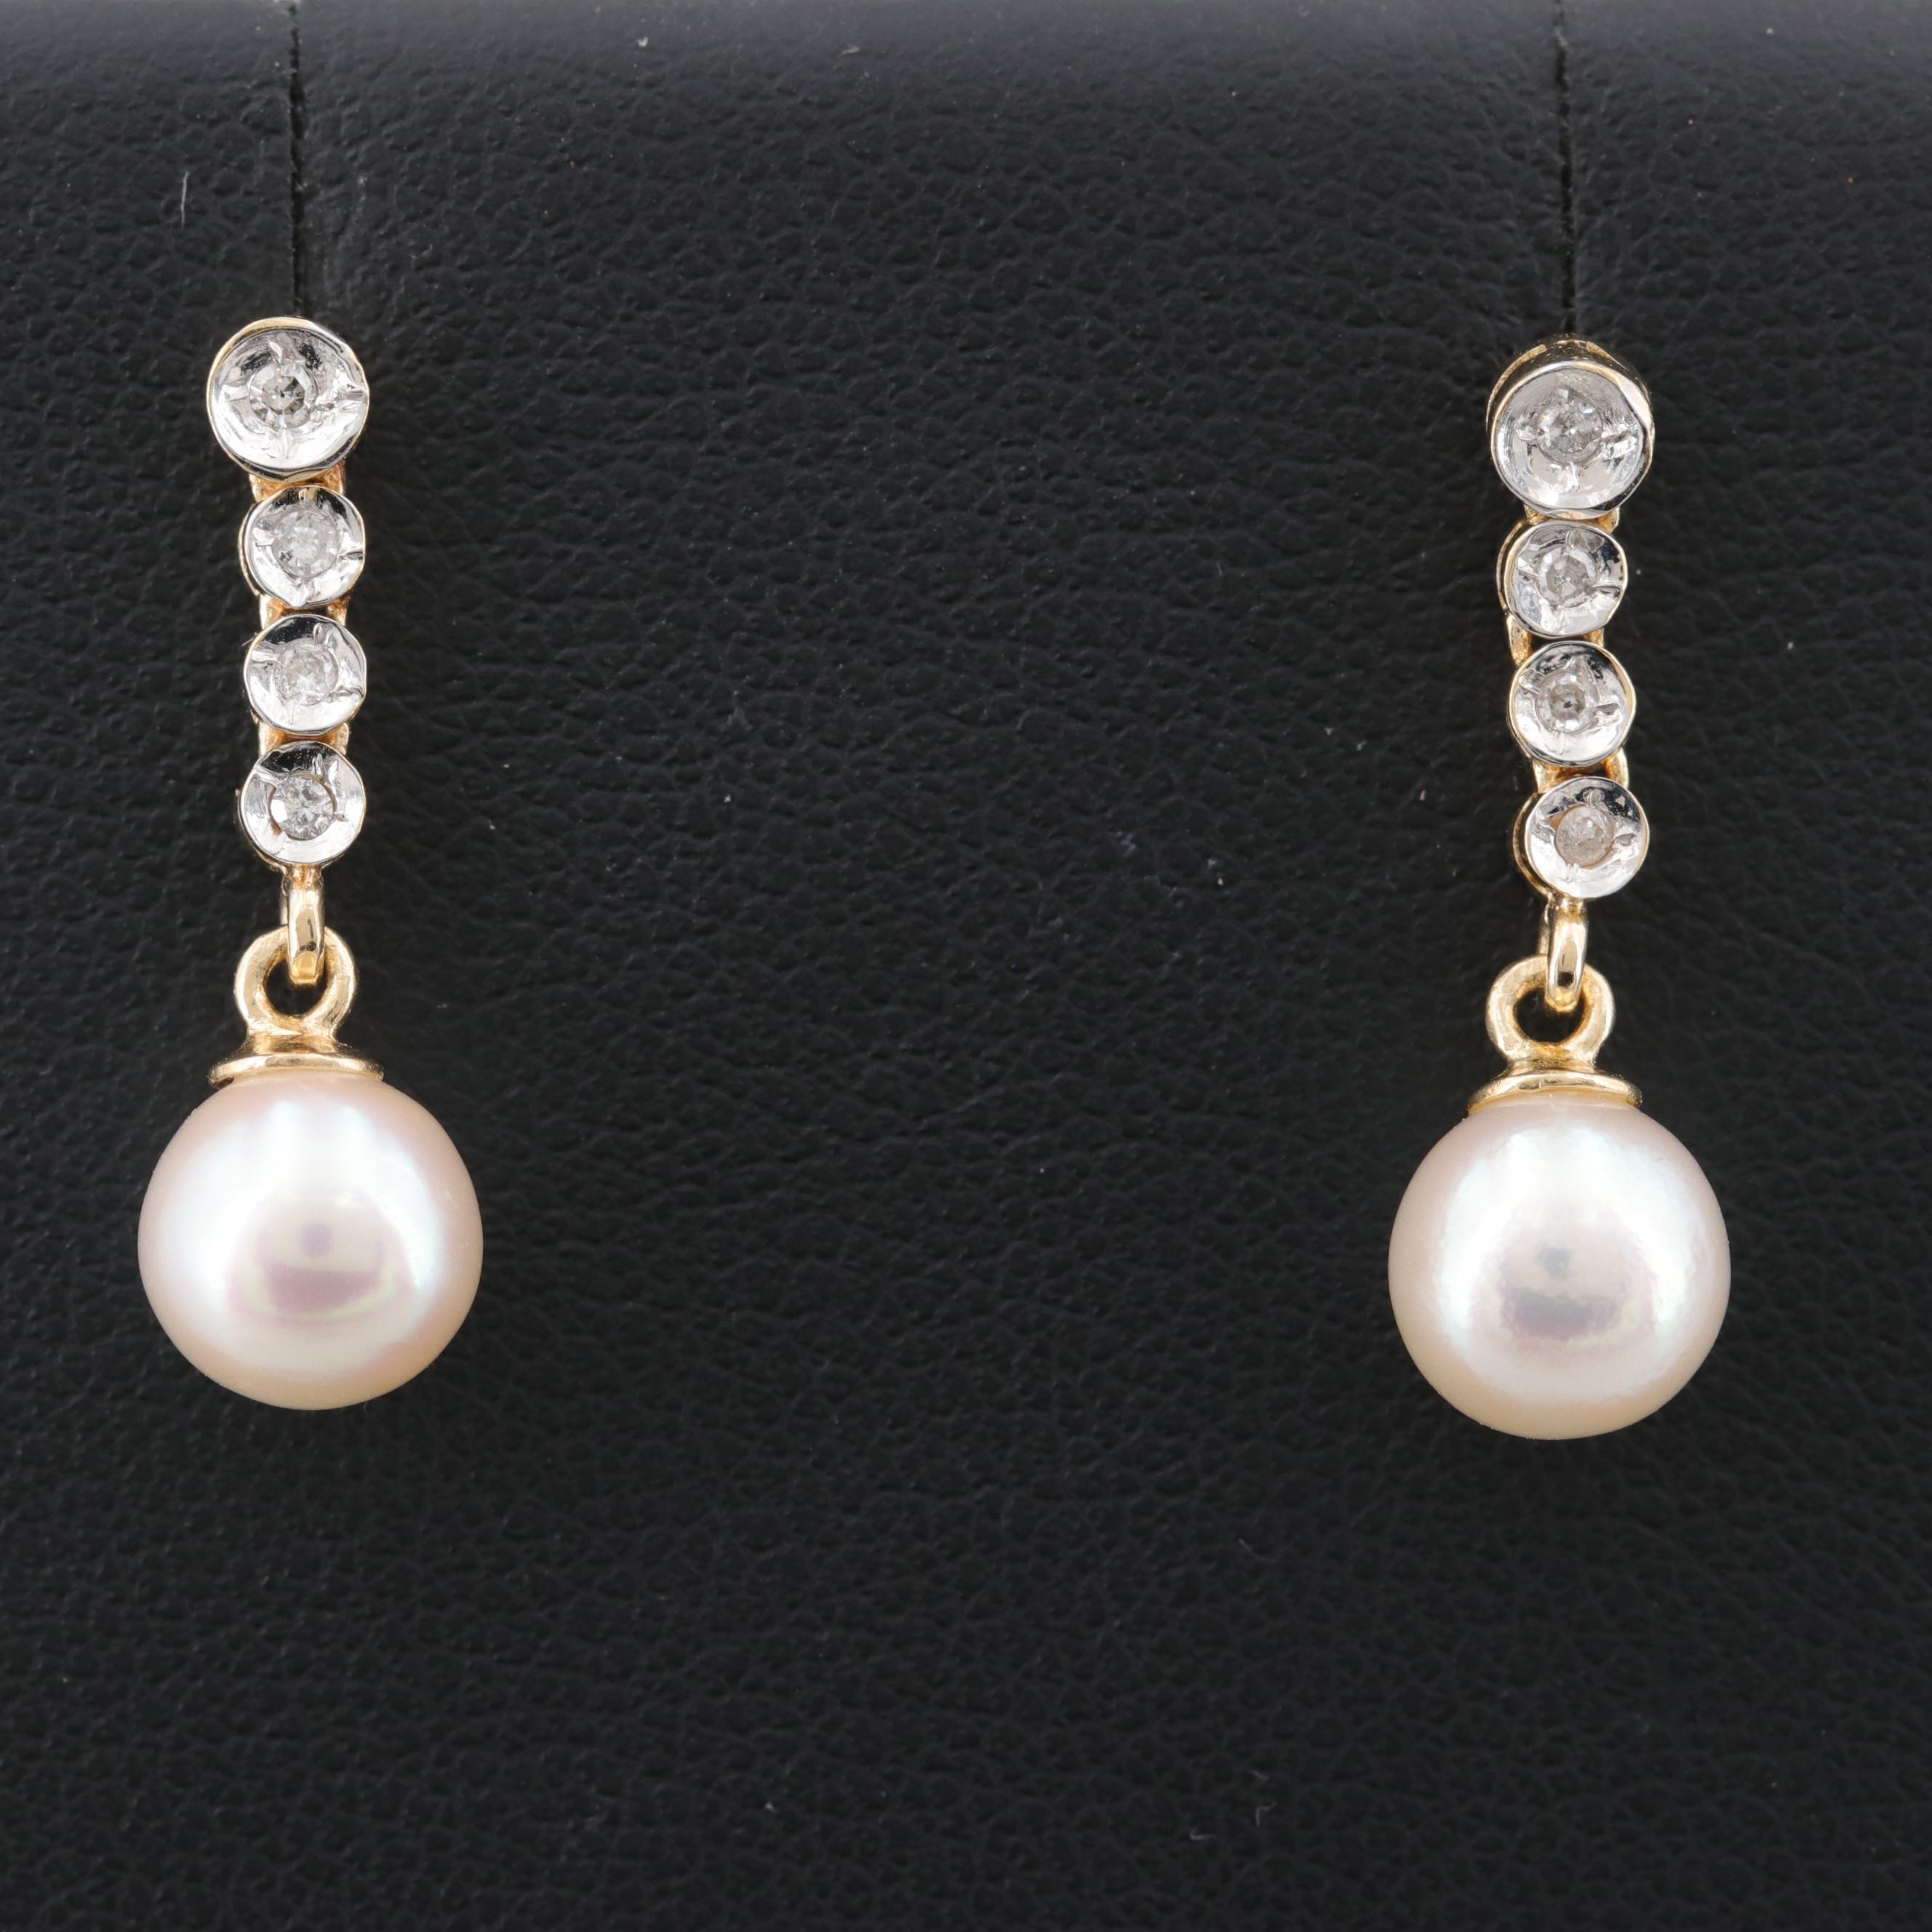 14K Yellow Gold Cultured Pearl and Diamond Dangle Earrings